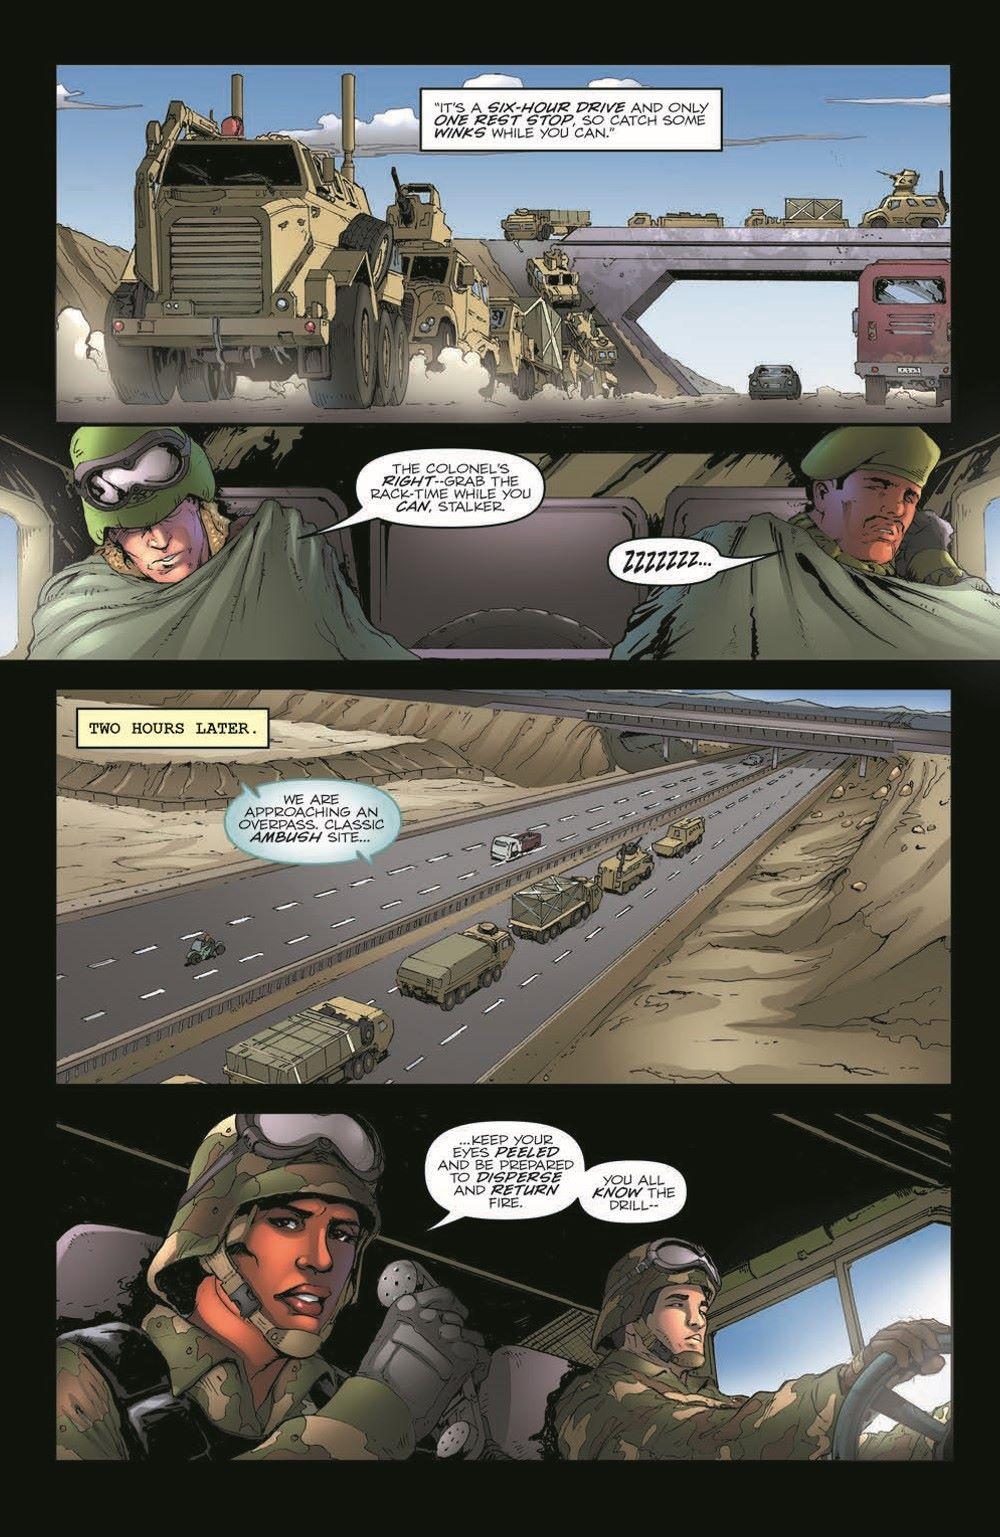 GIJoeRAH281-pr-6 ComicList Previews: G.I. JOE A REAL AMERICAN HERO #281